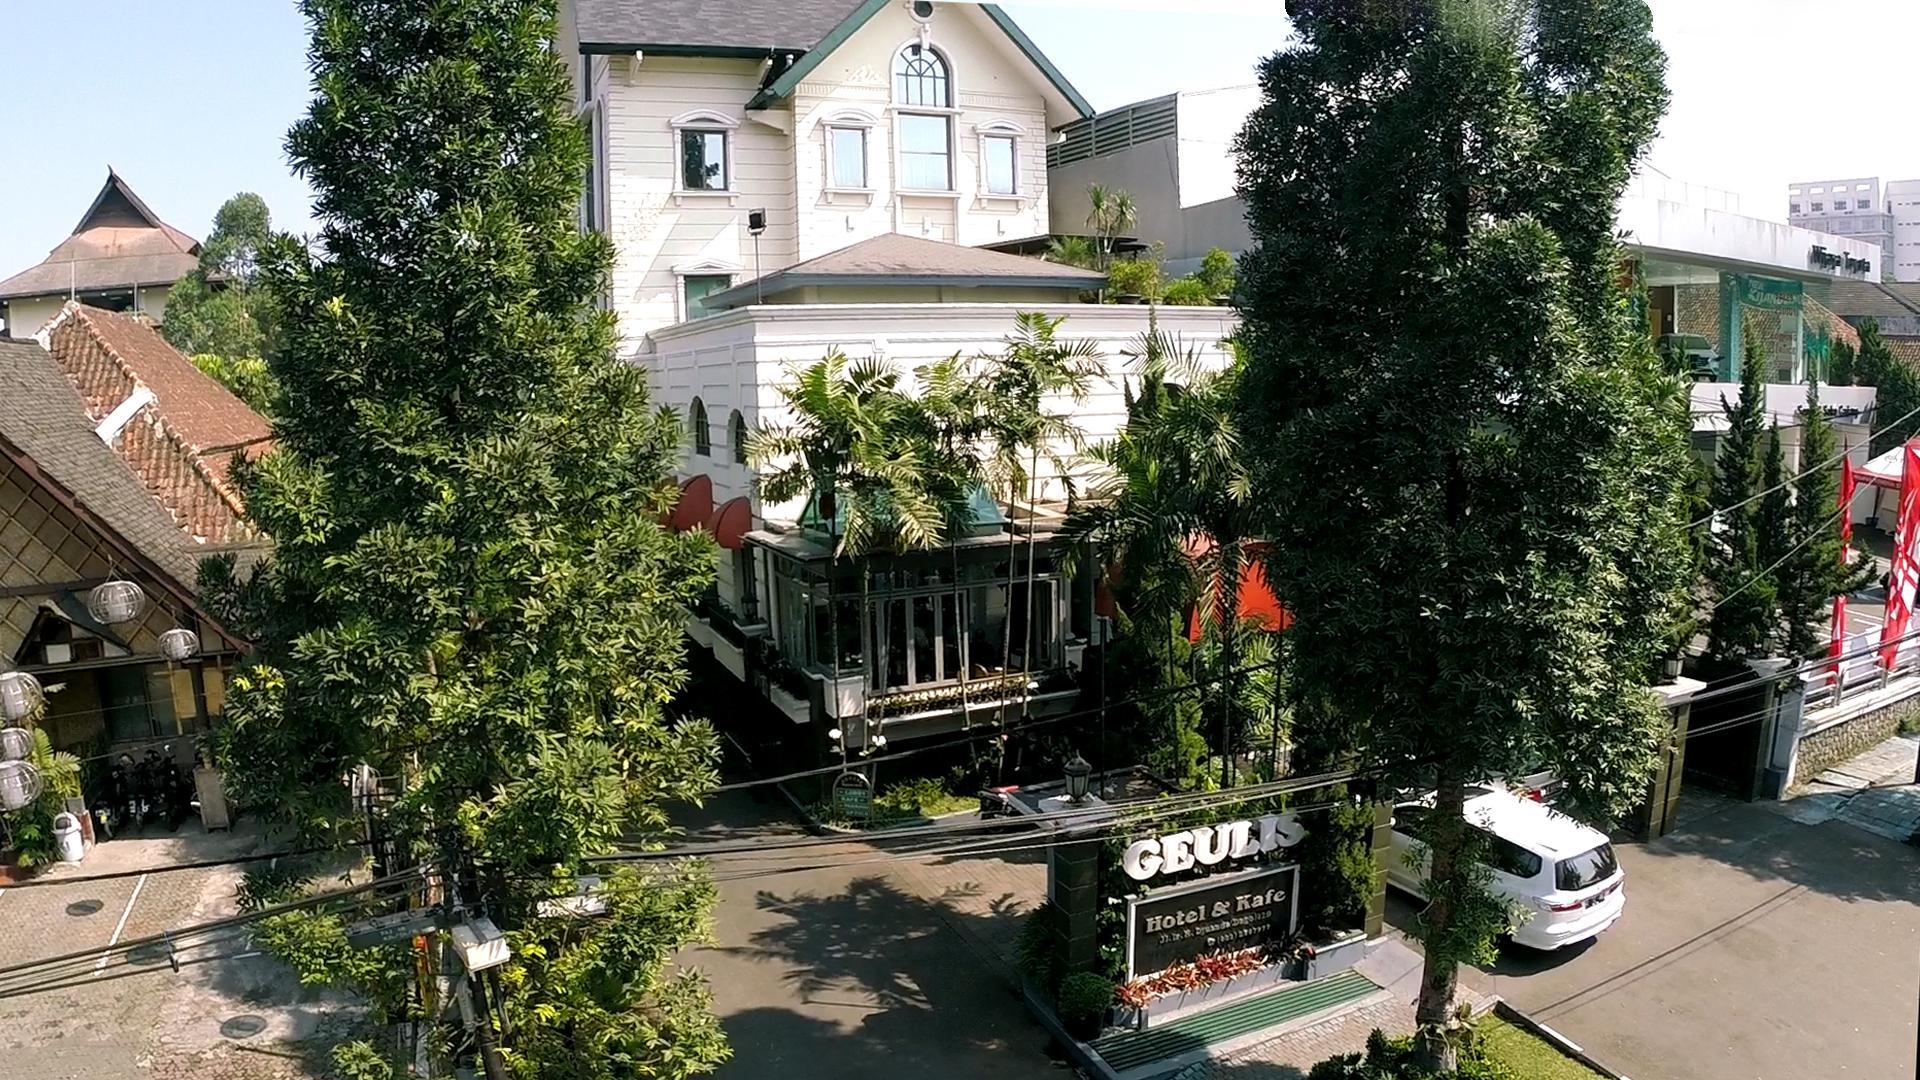 Geulis Boutique Hotel